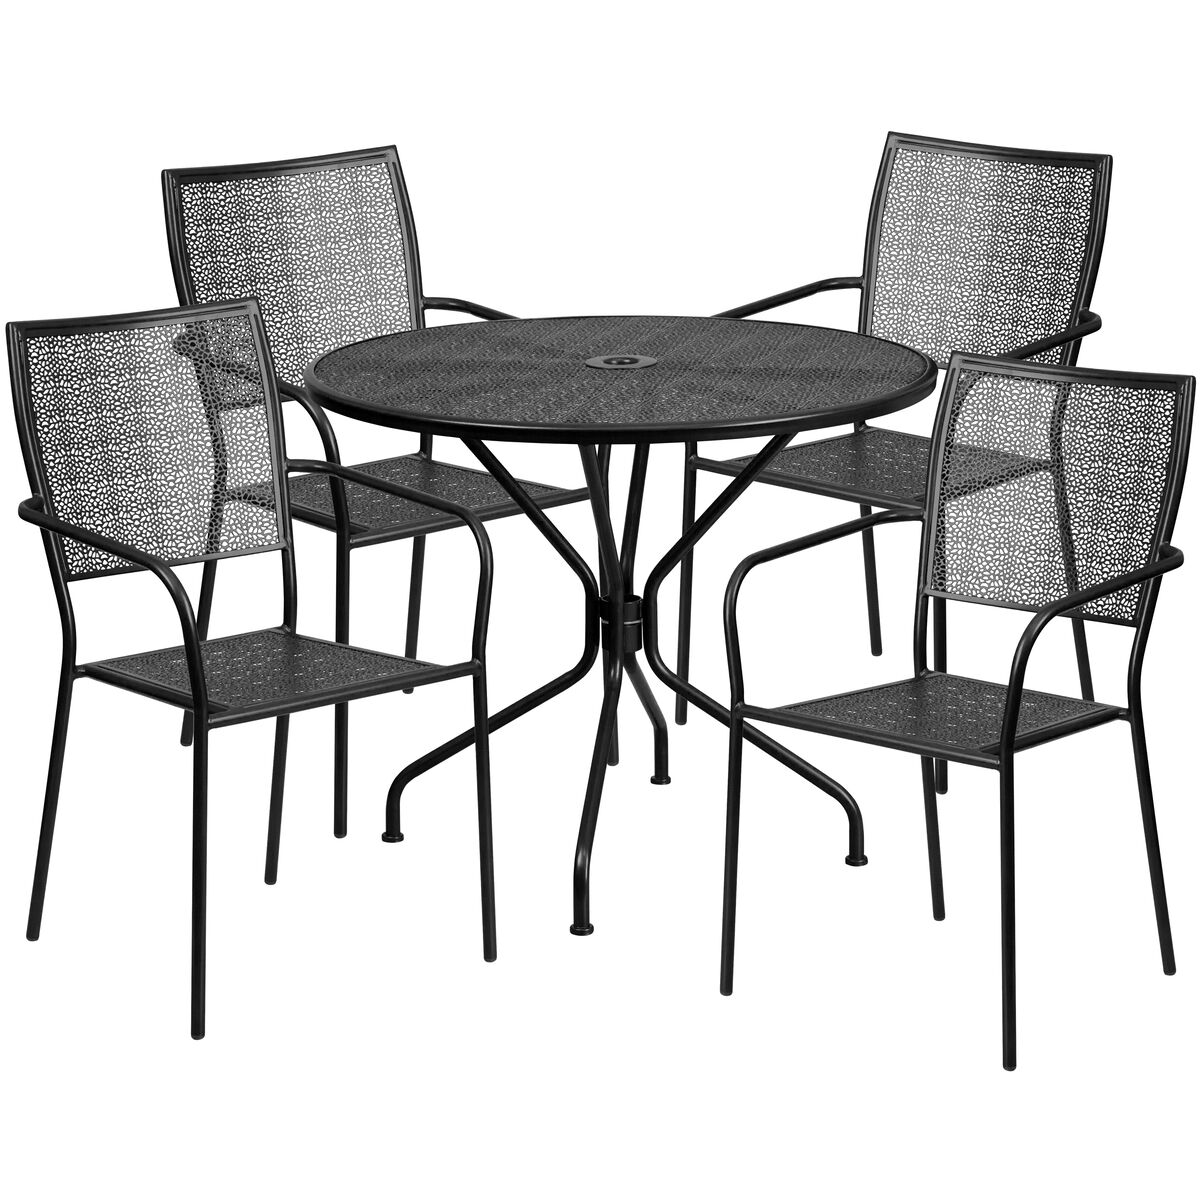 Flash furniture round black indoor outdoor steel for Furniture 35